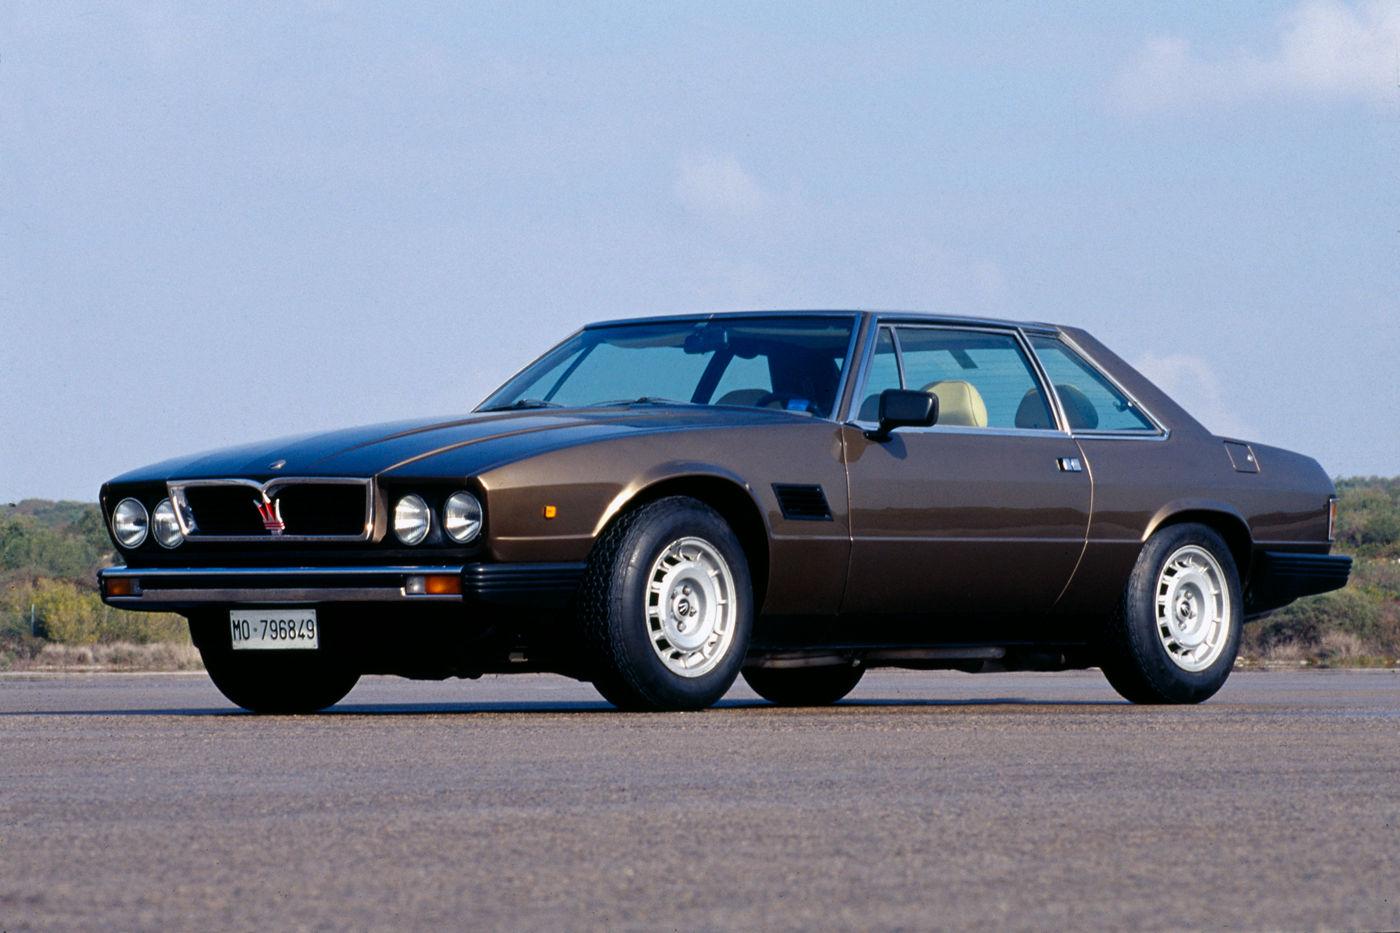 Maserati Classic - GranTurismo Kyalami - carrosserie marron - vue latérale